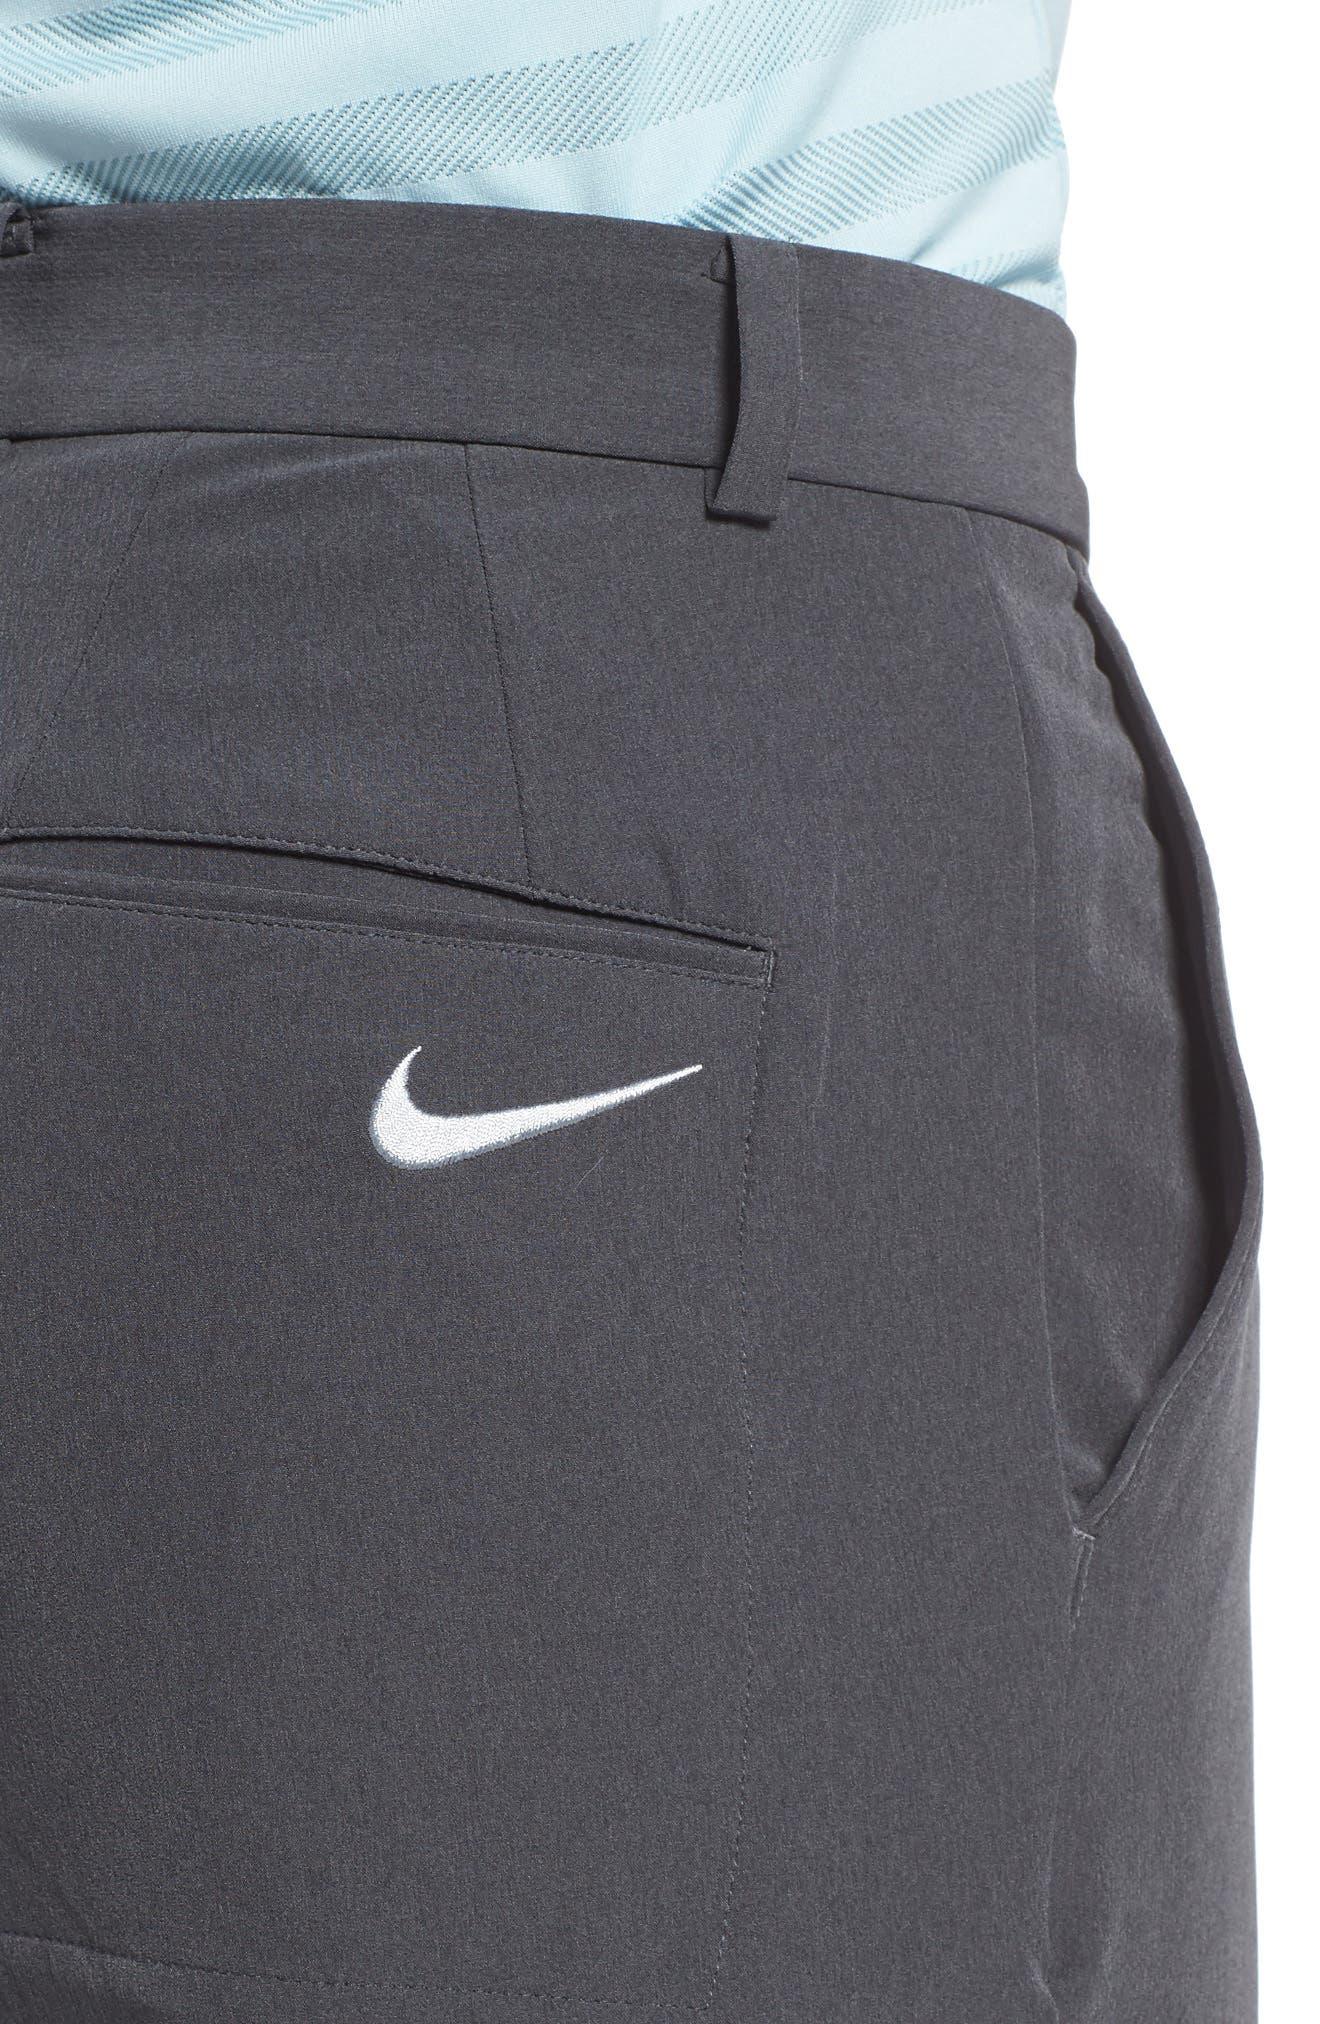 Hybrid Flex Golf Pants,                             Alternate thumbnail 4, color,                             CHARCOAL HEATHER/ DARK GREY